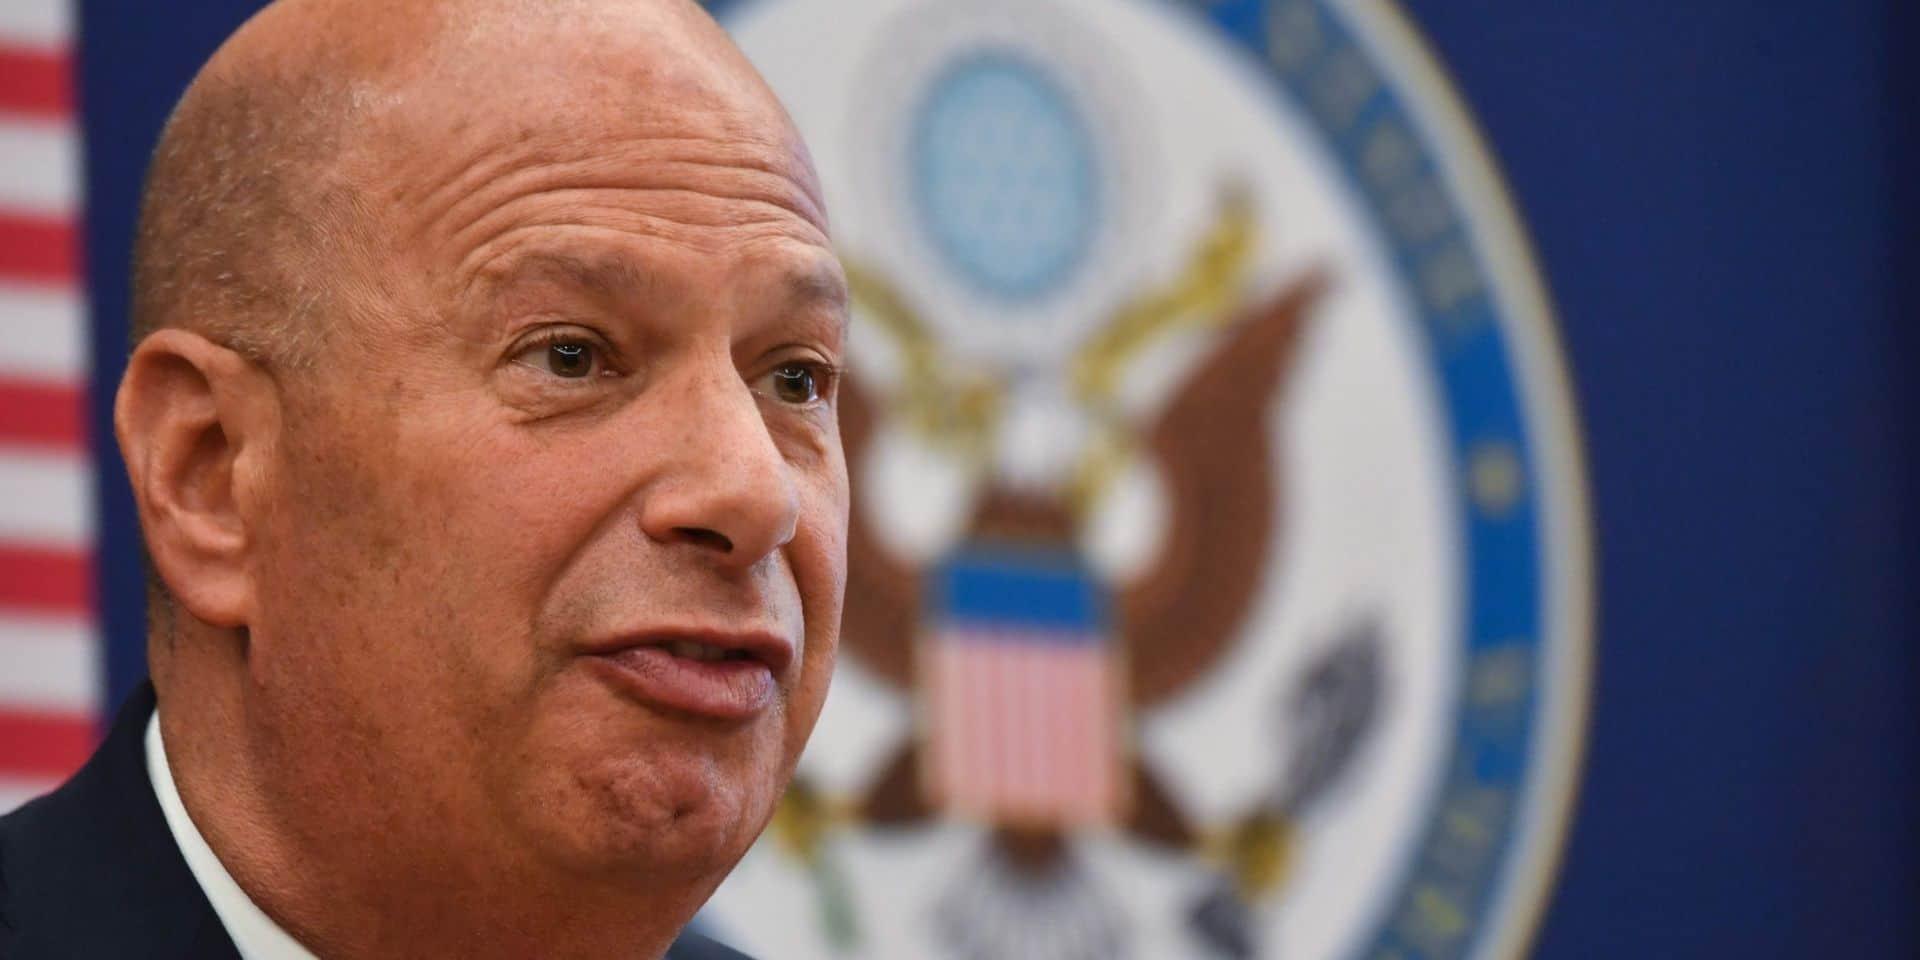 Procédure de destitution de Trump: un ambassadeur américain témoignera malgré l'interdiction de l'exécutif